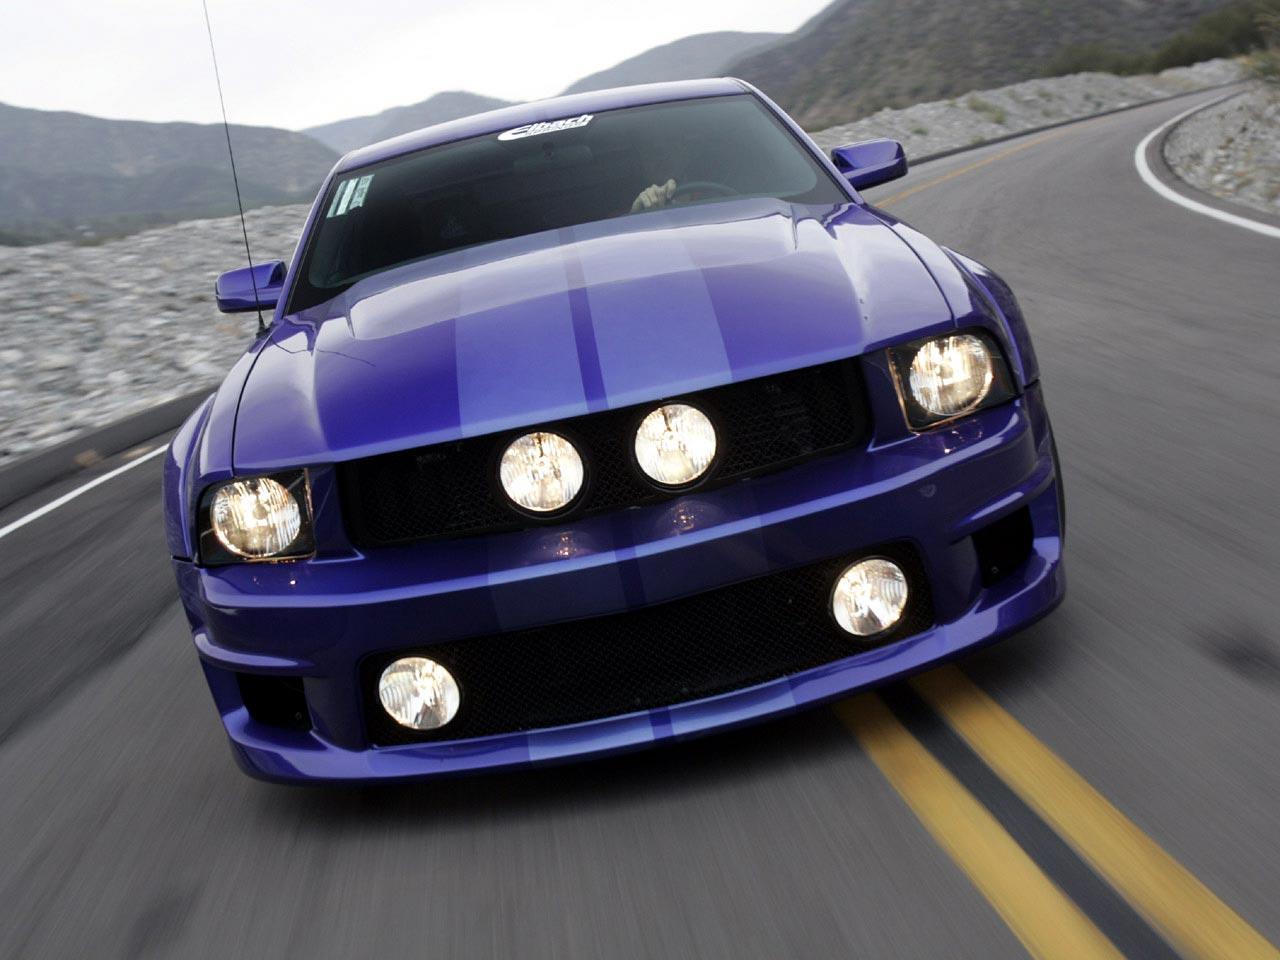 Hd Wallpapers Mustang Gt Jessica Alba Hd Iphone Wallpaper 1280x960